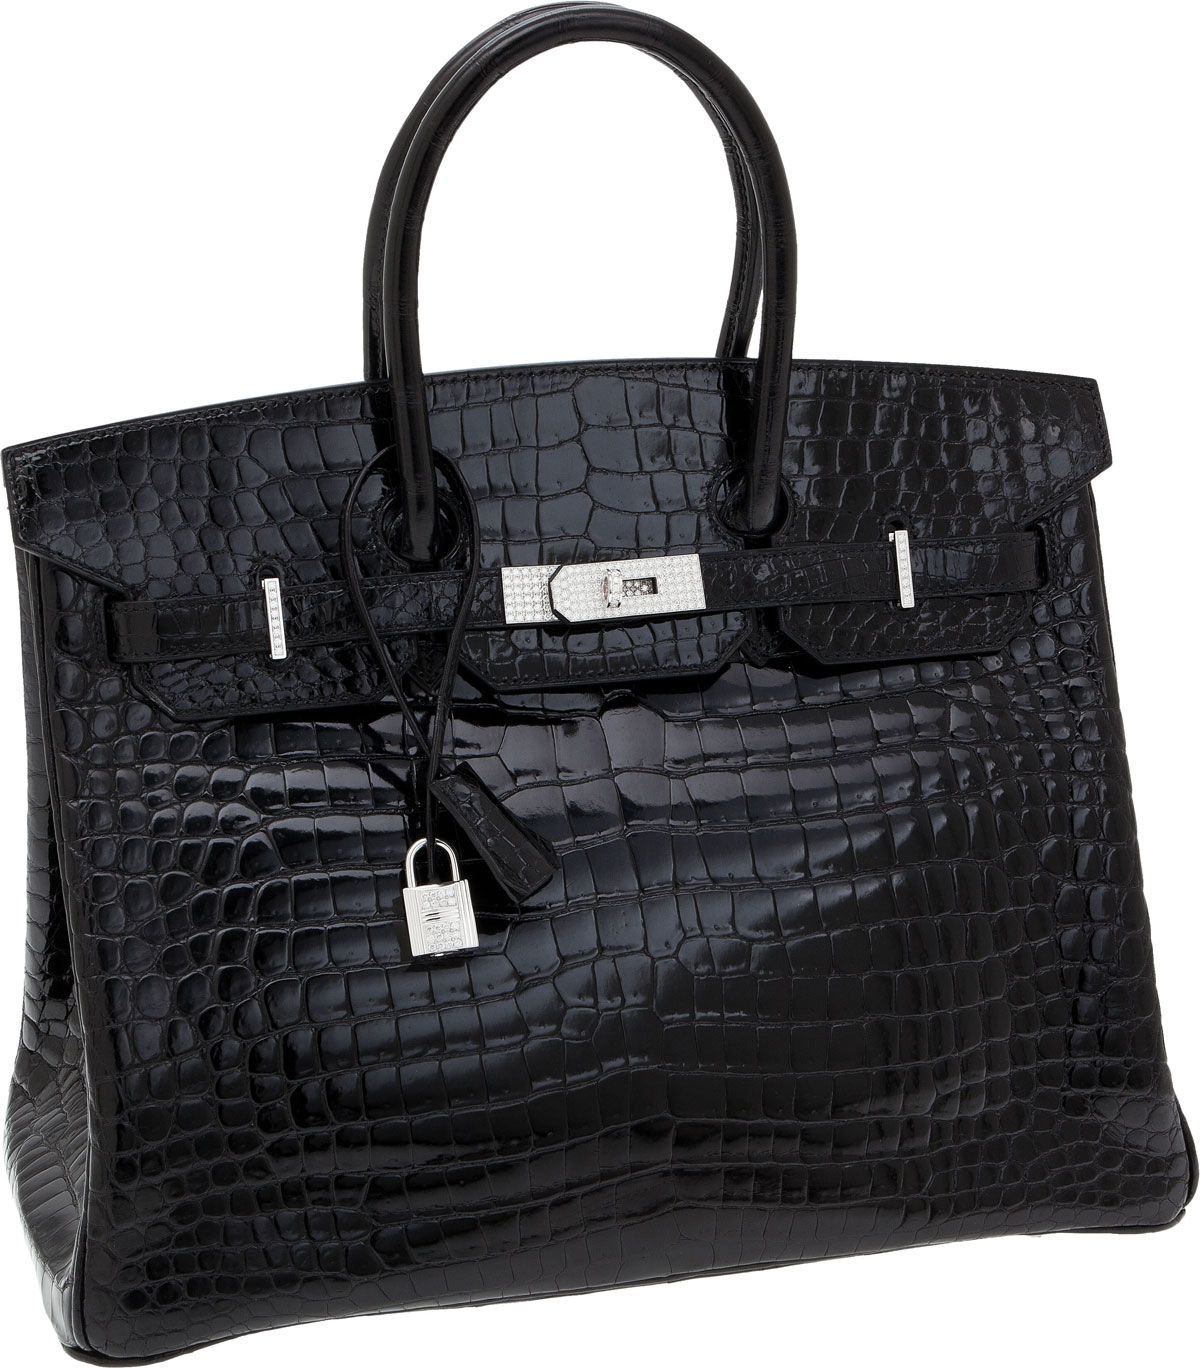 coupon code for hermes 30cm matte havana nilo crocodile birkin bag with  palladium hardware 48645 4991b d0d83a3d0598b